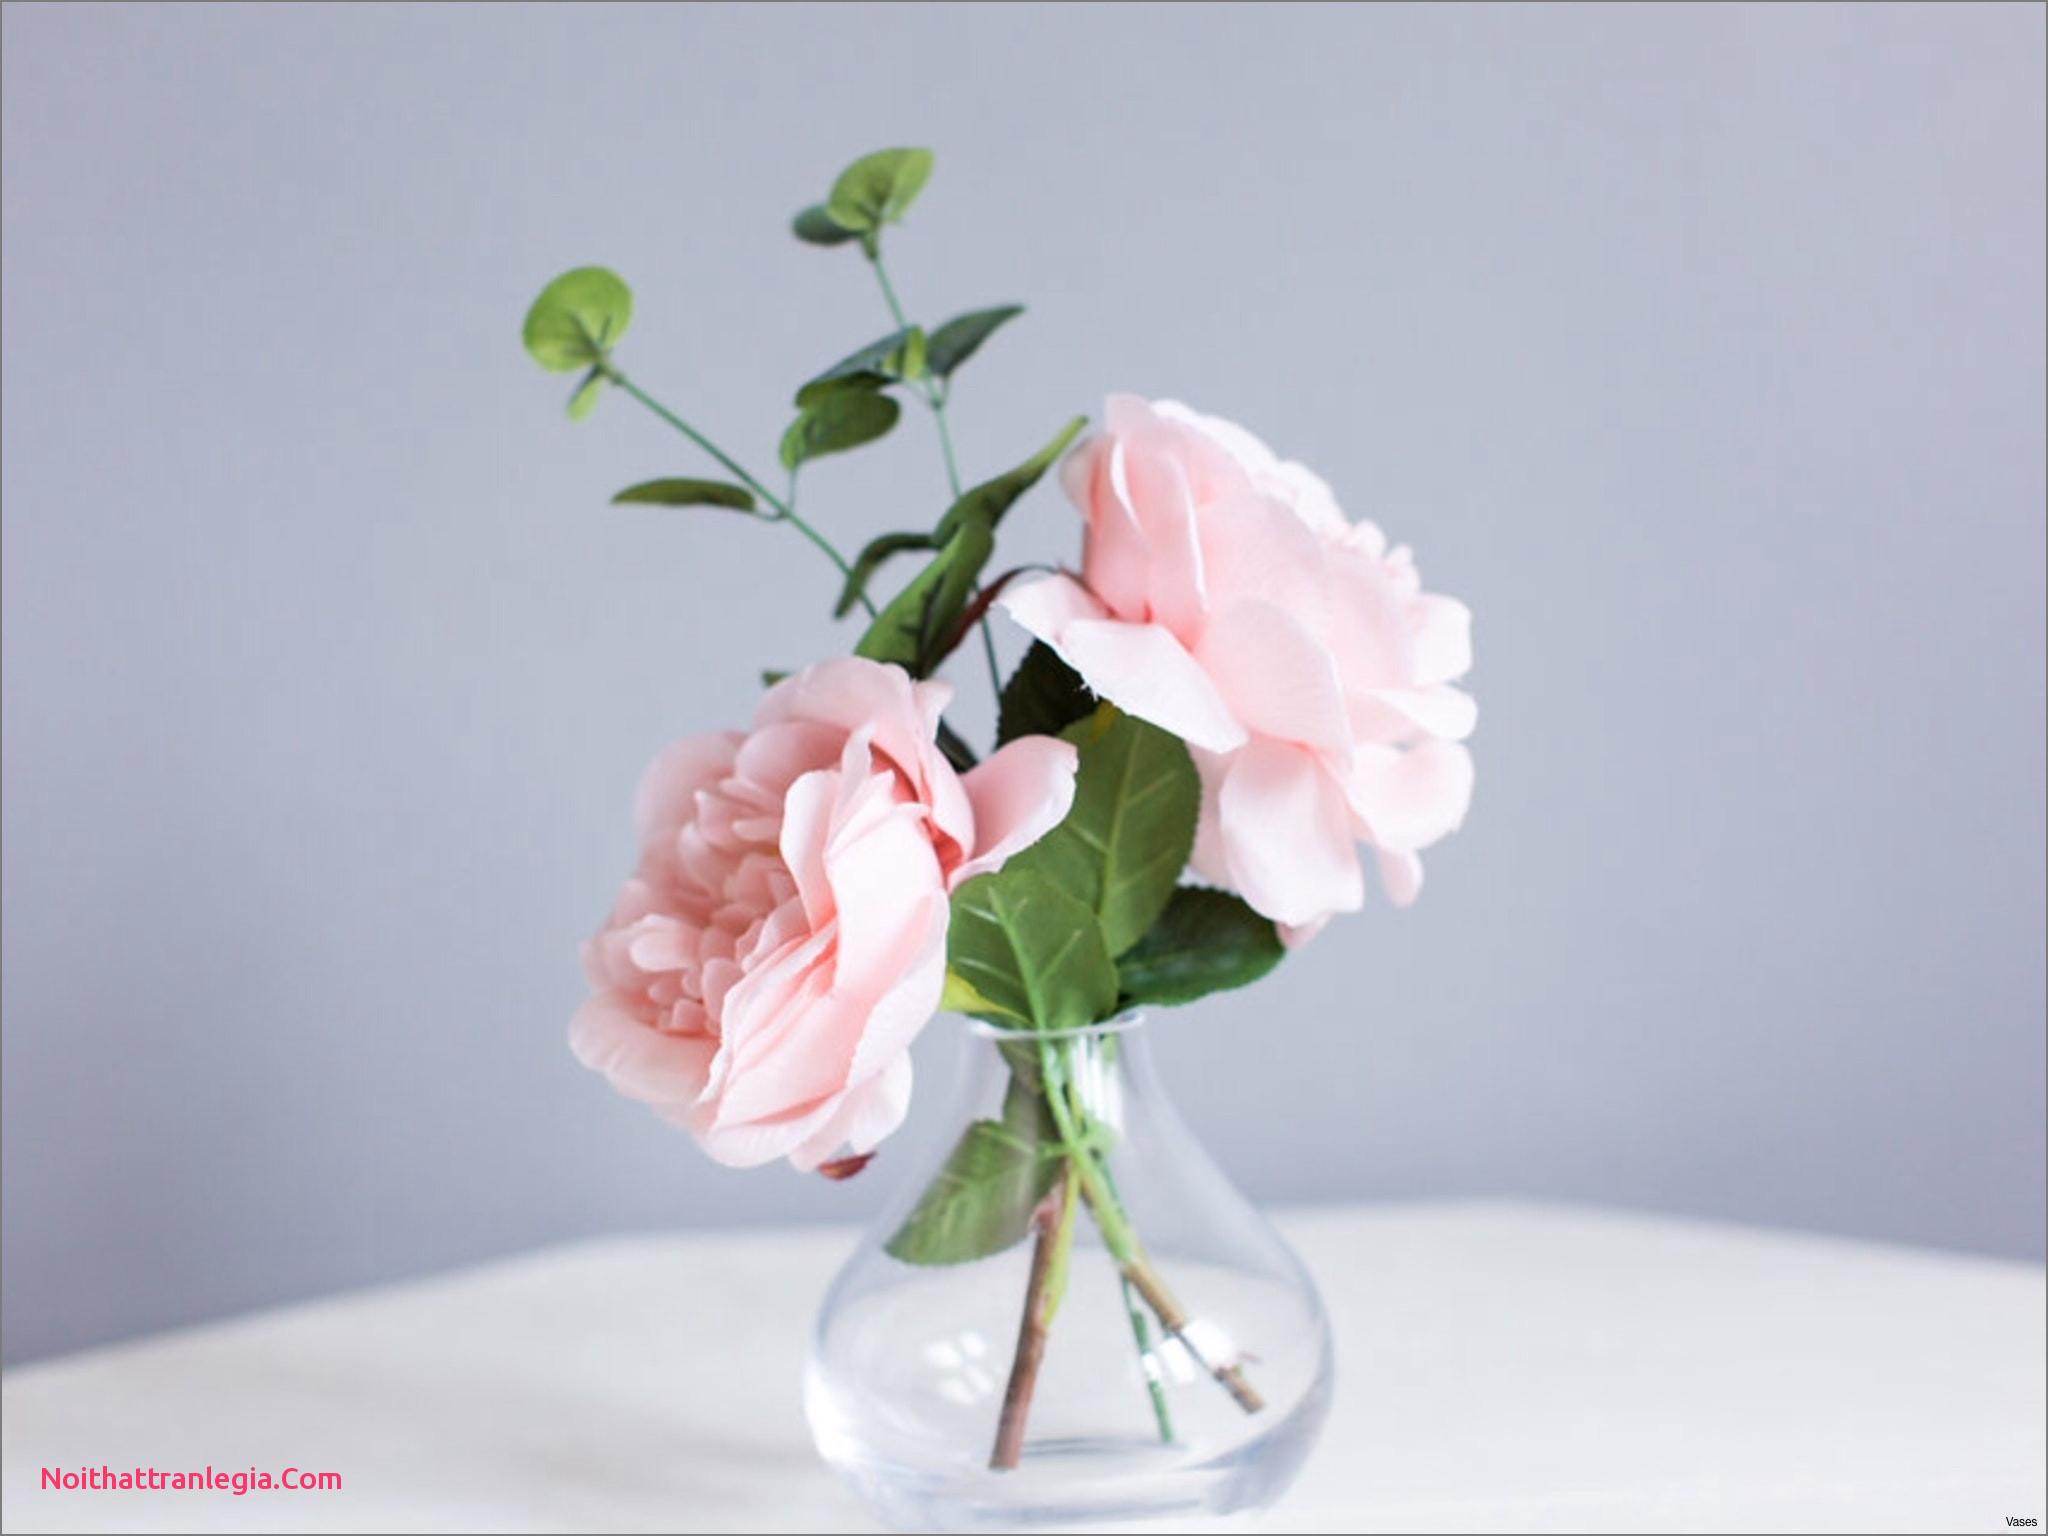 tall silver vases for wedding centerpieces of 20 wedding vases noithattranlegia vases design inside cool wedding ideas as for h vases bud vase flower arrangements i 0d for inspiration design